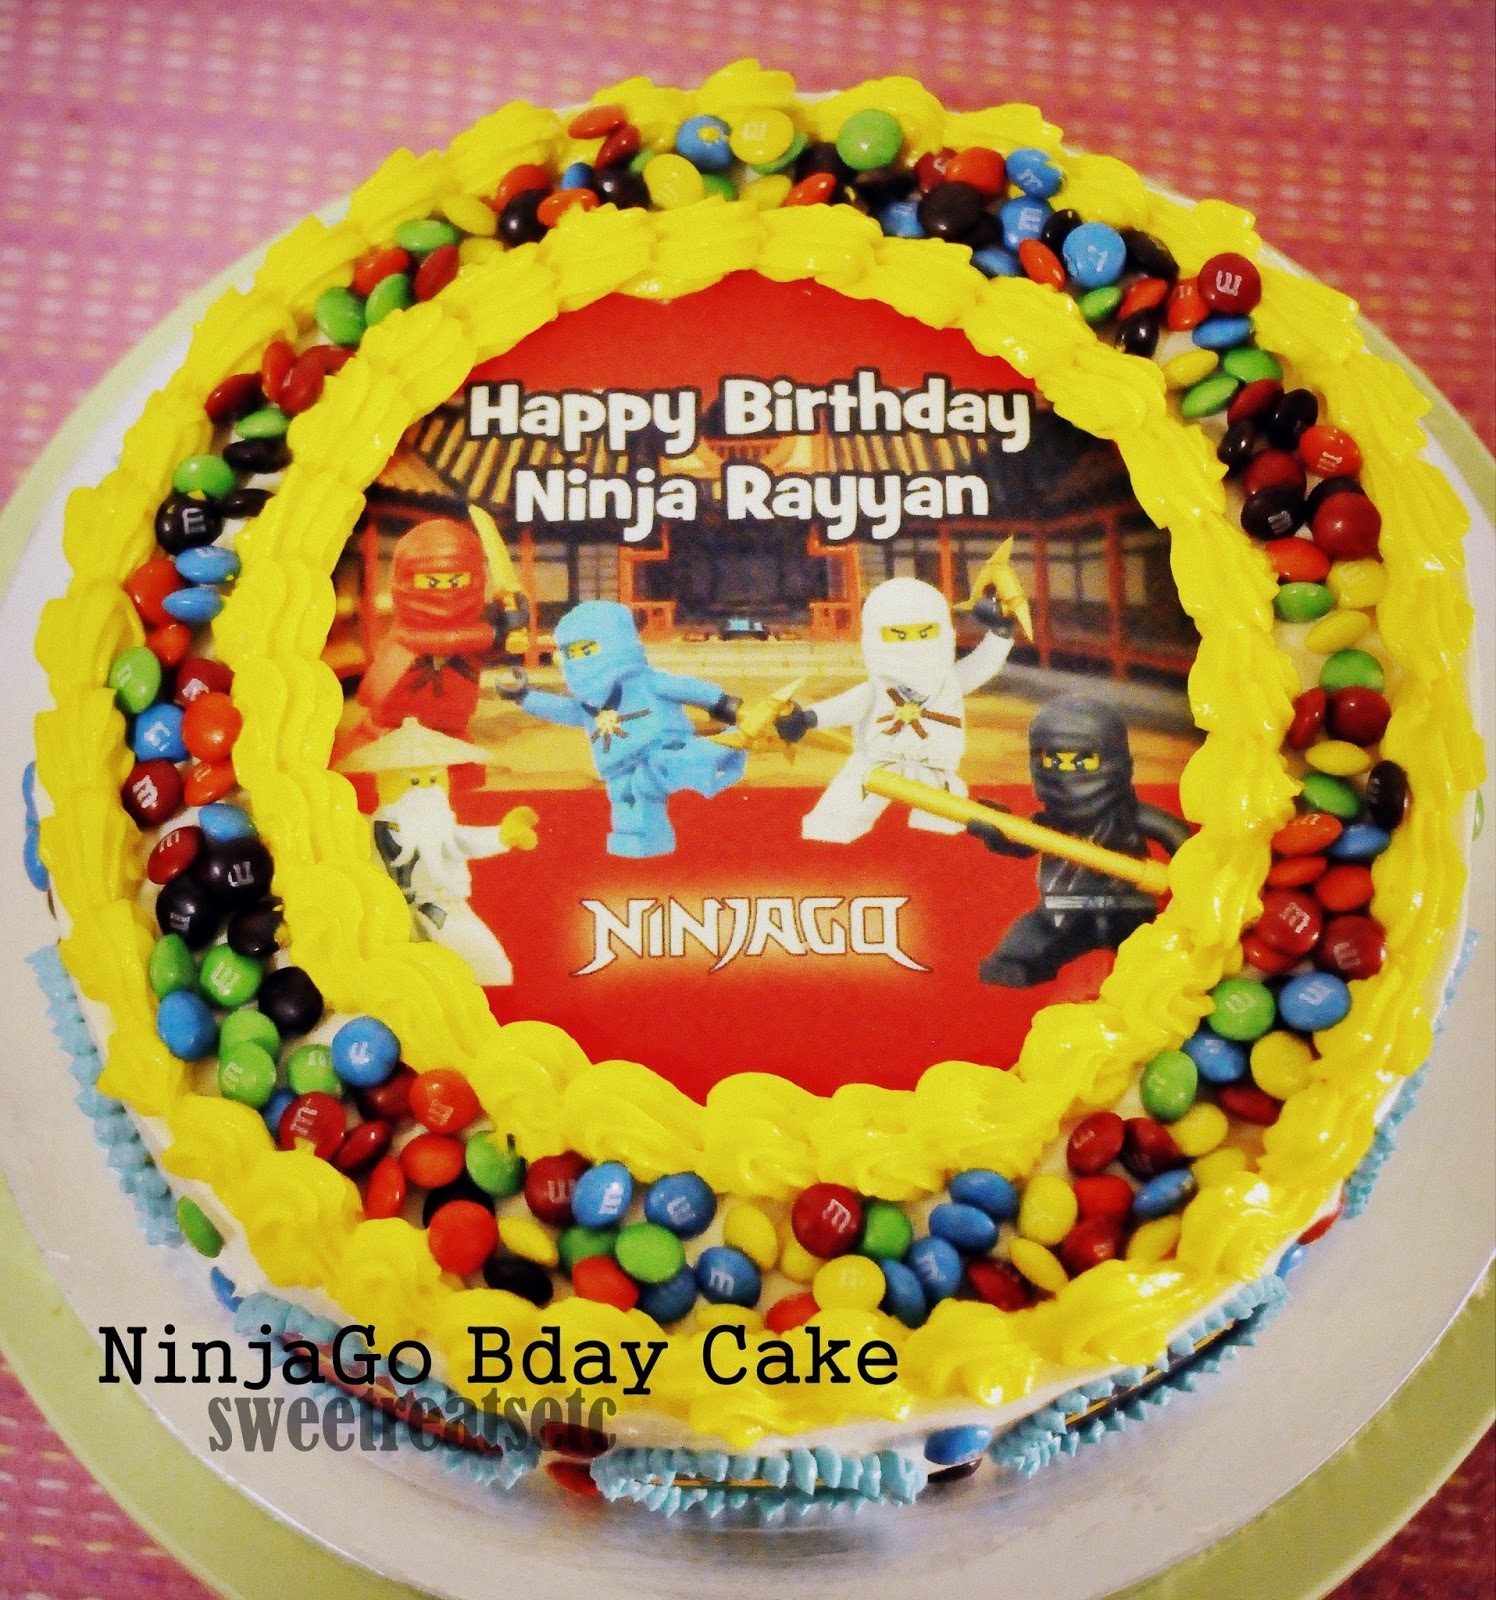 Sweetreats Etcetera: NinjaGo Theme Birthday Cake